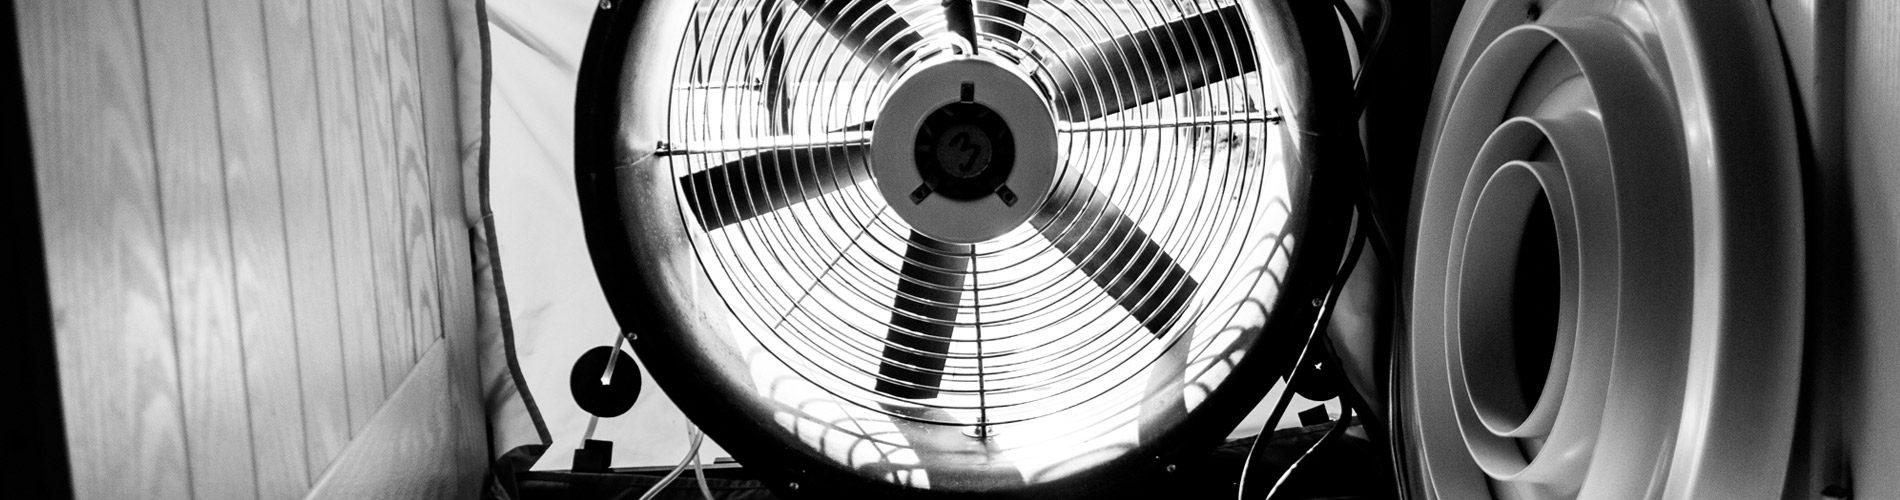 Ventilation testing header